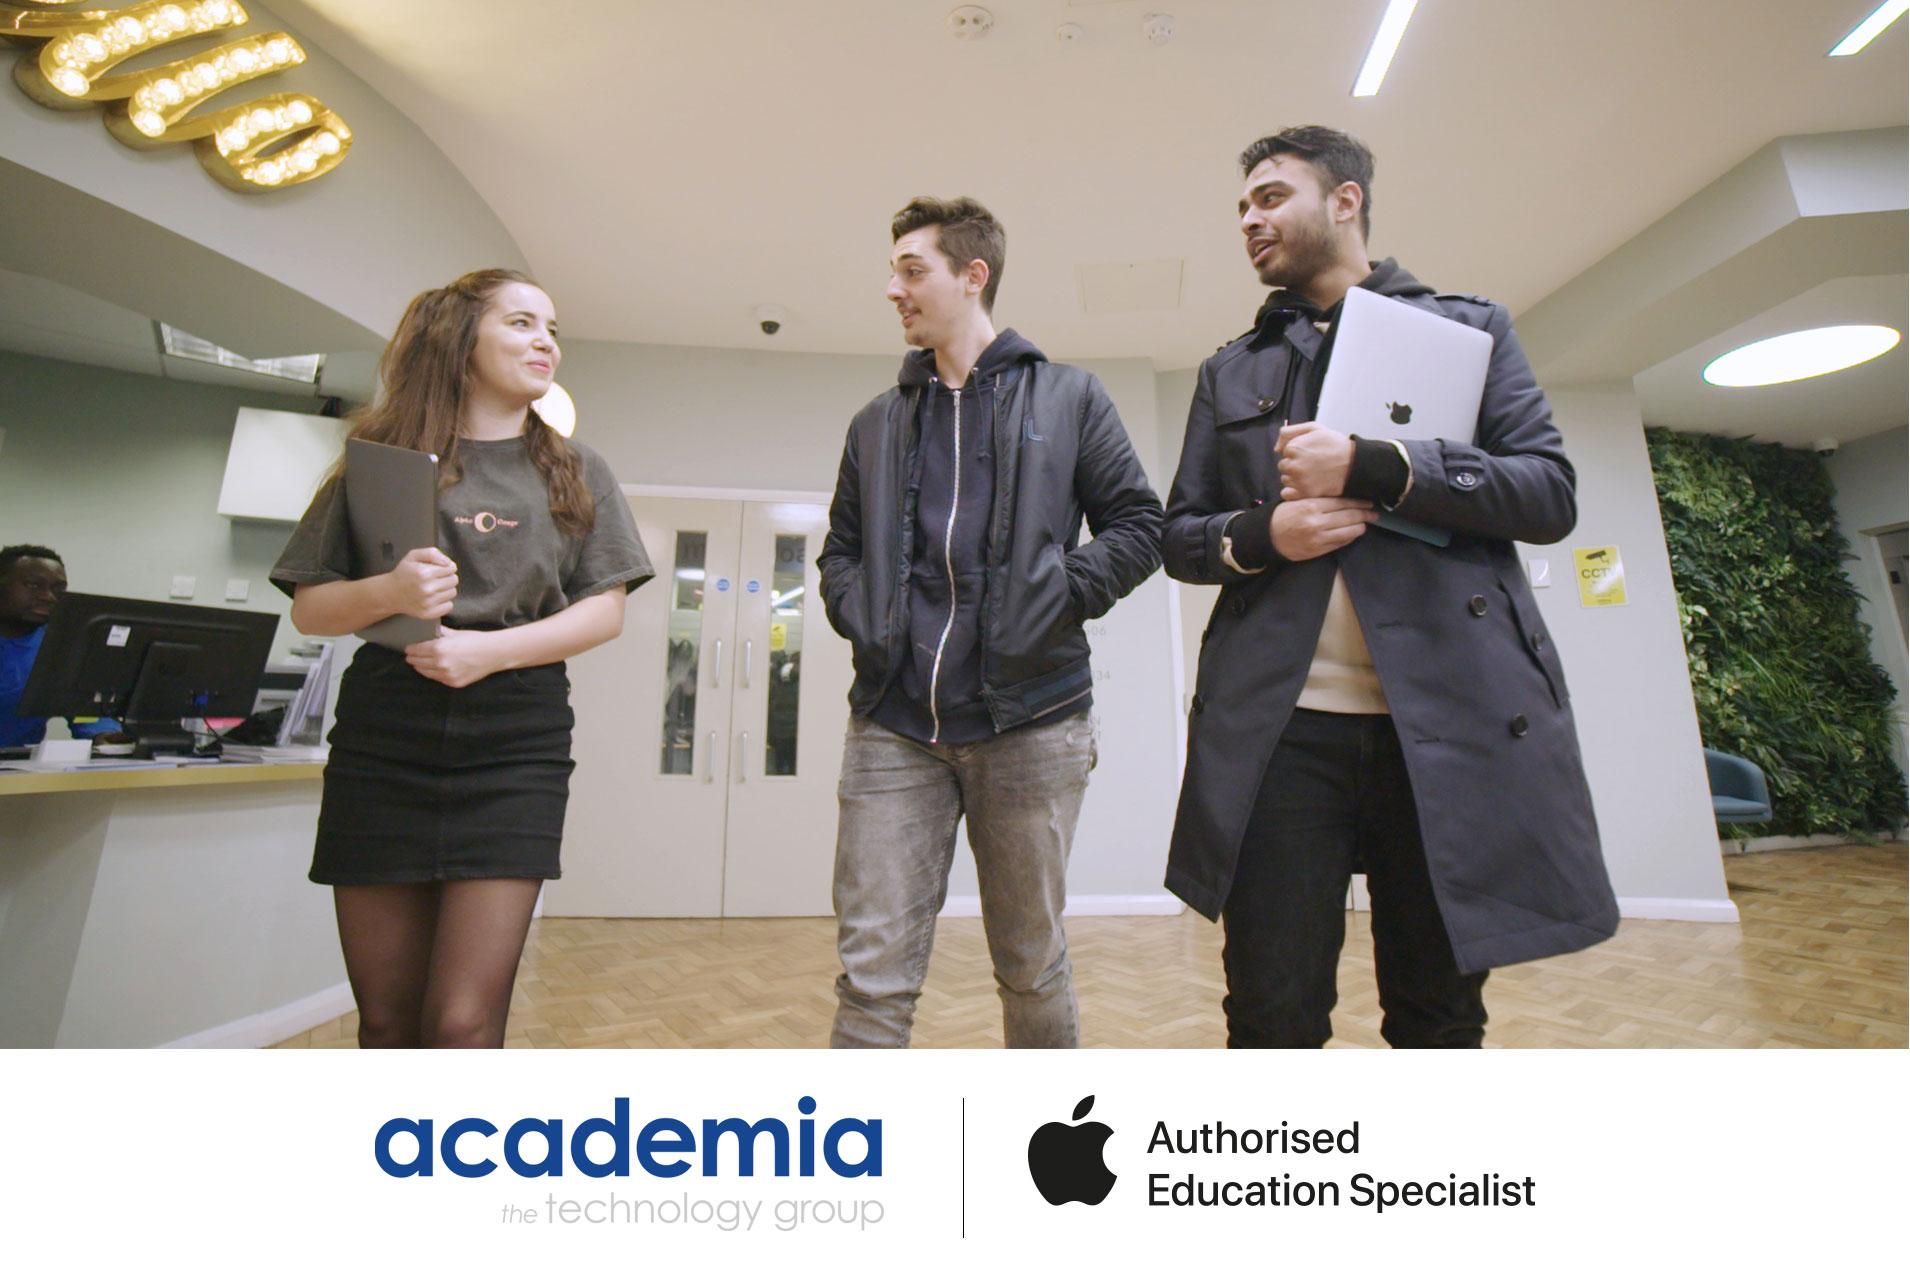 Academia AAES